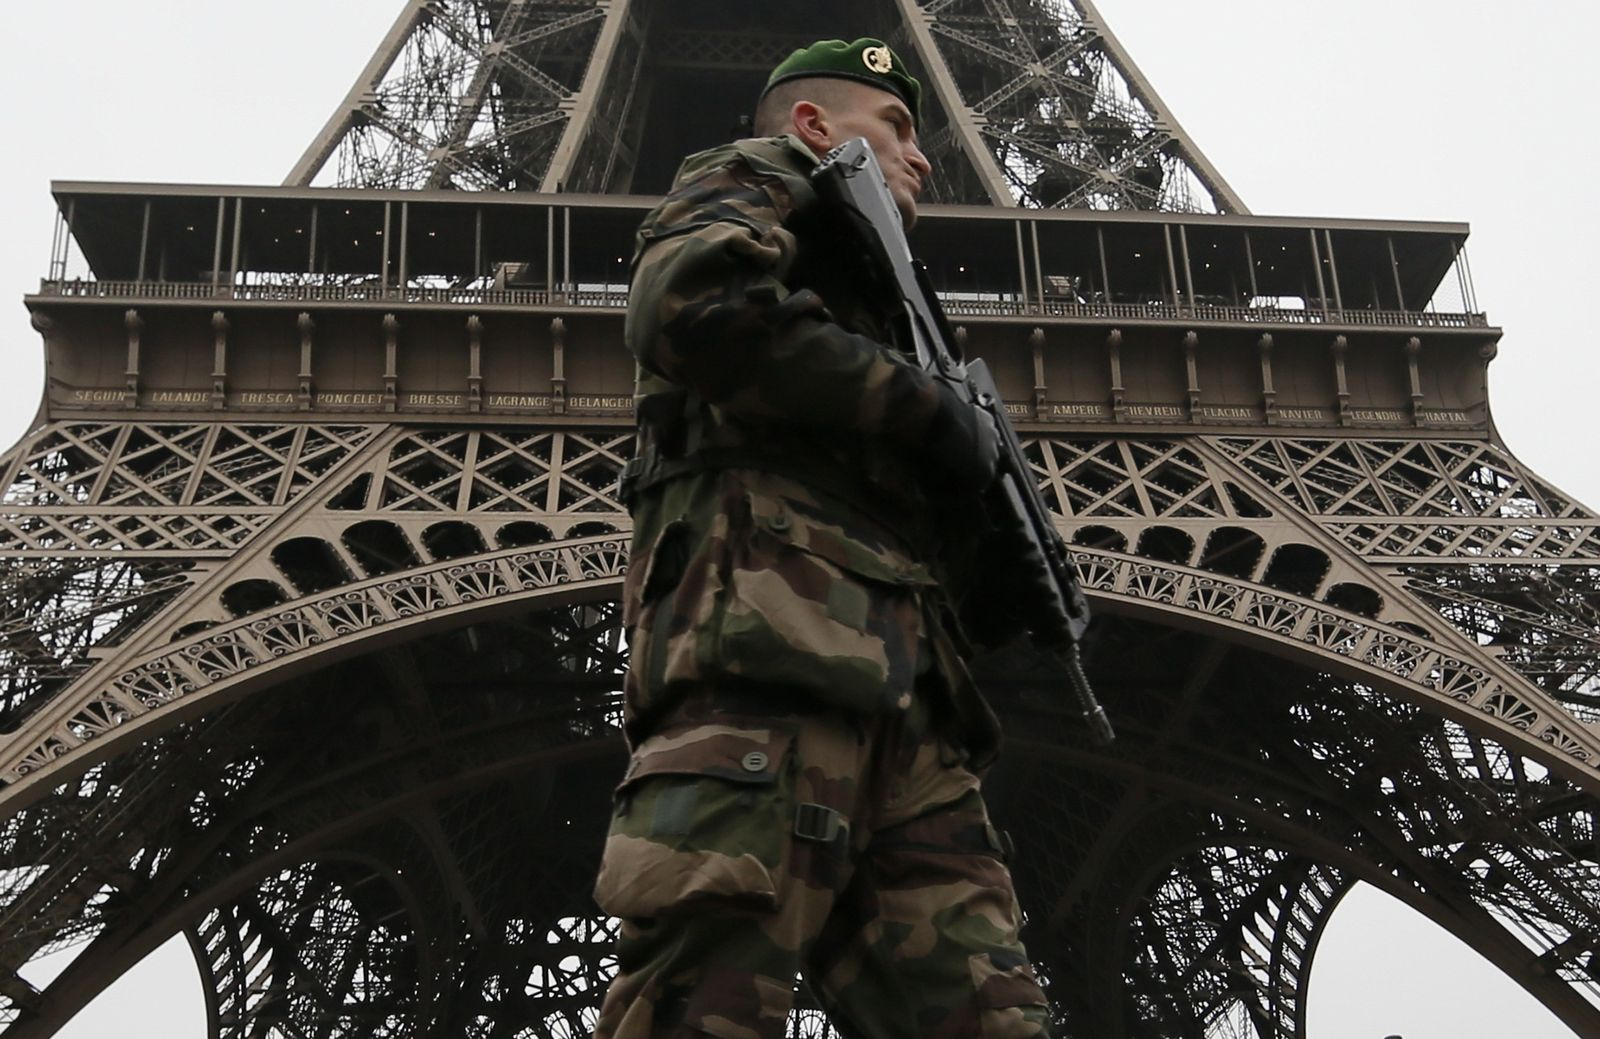 frankreich eifelturm soldat